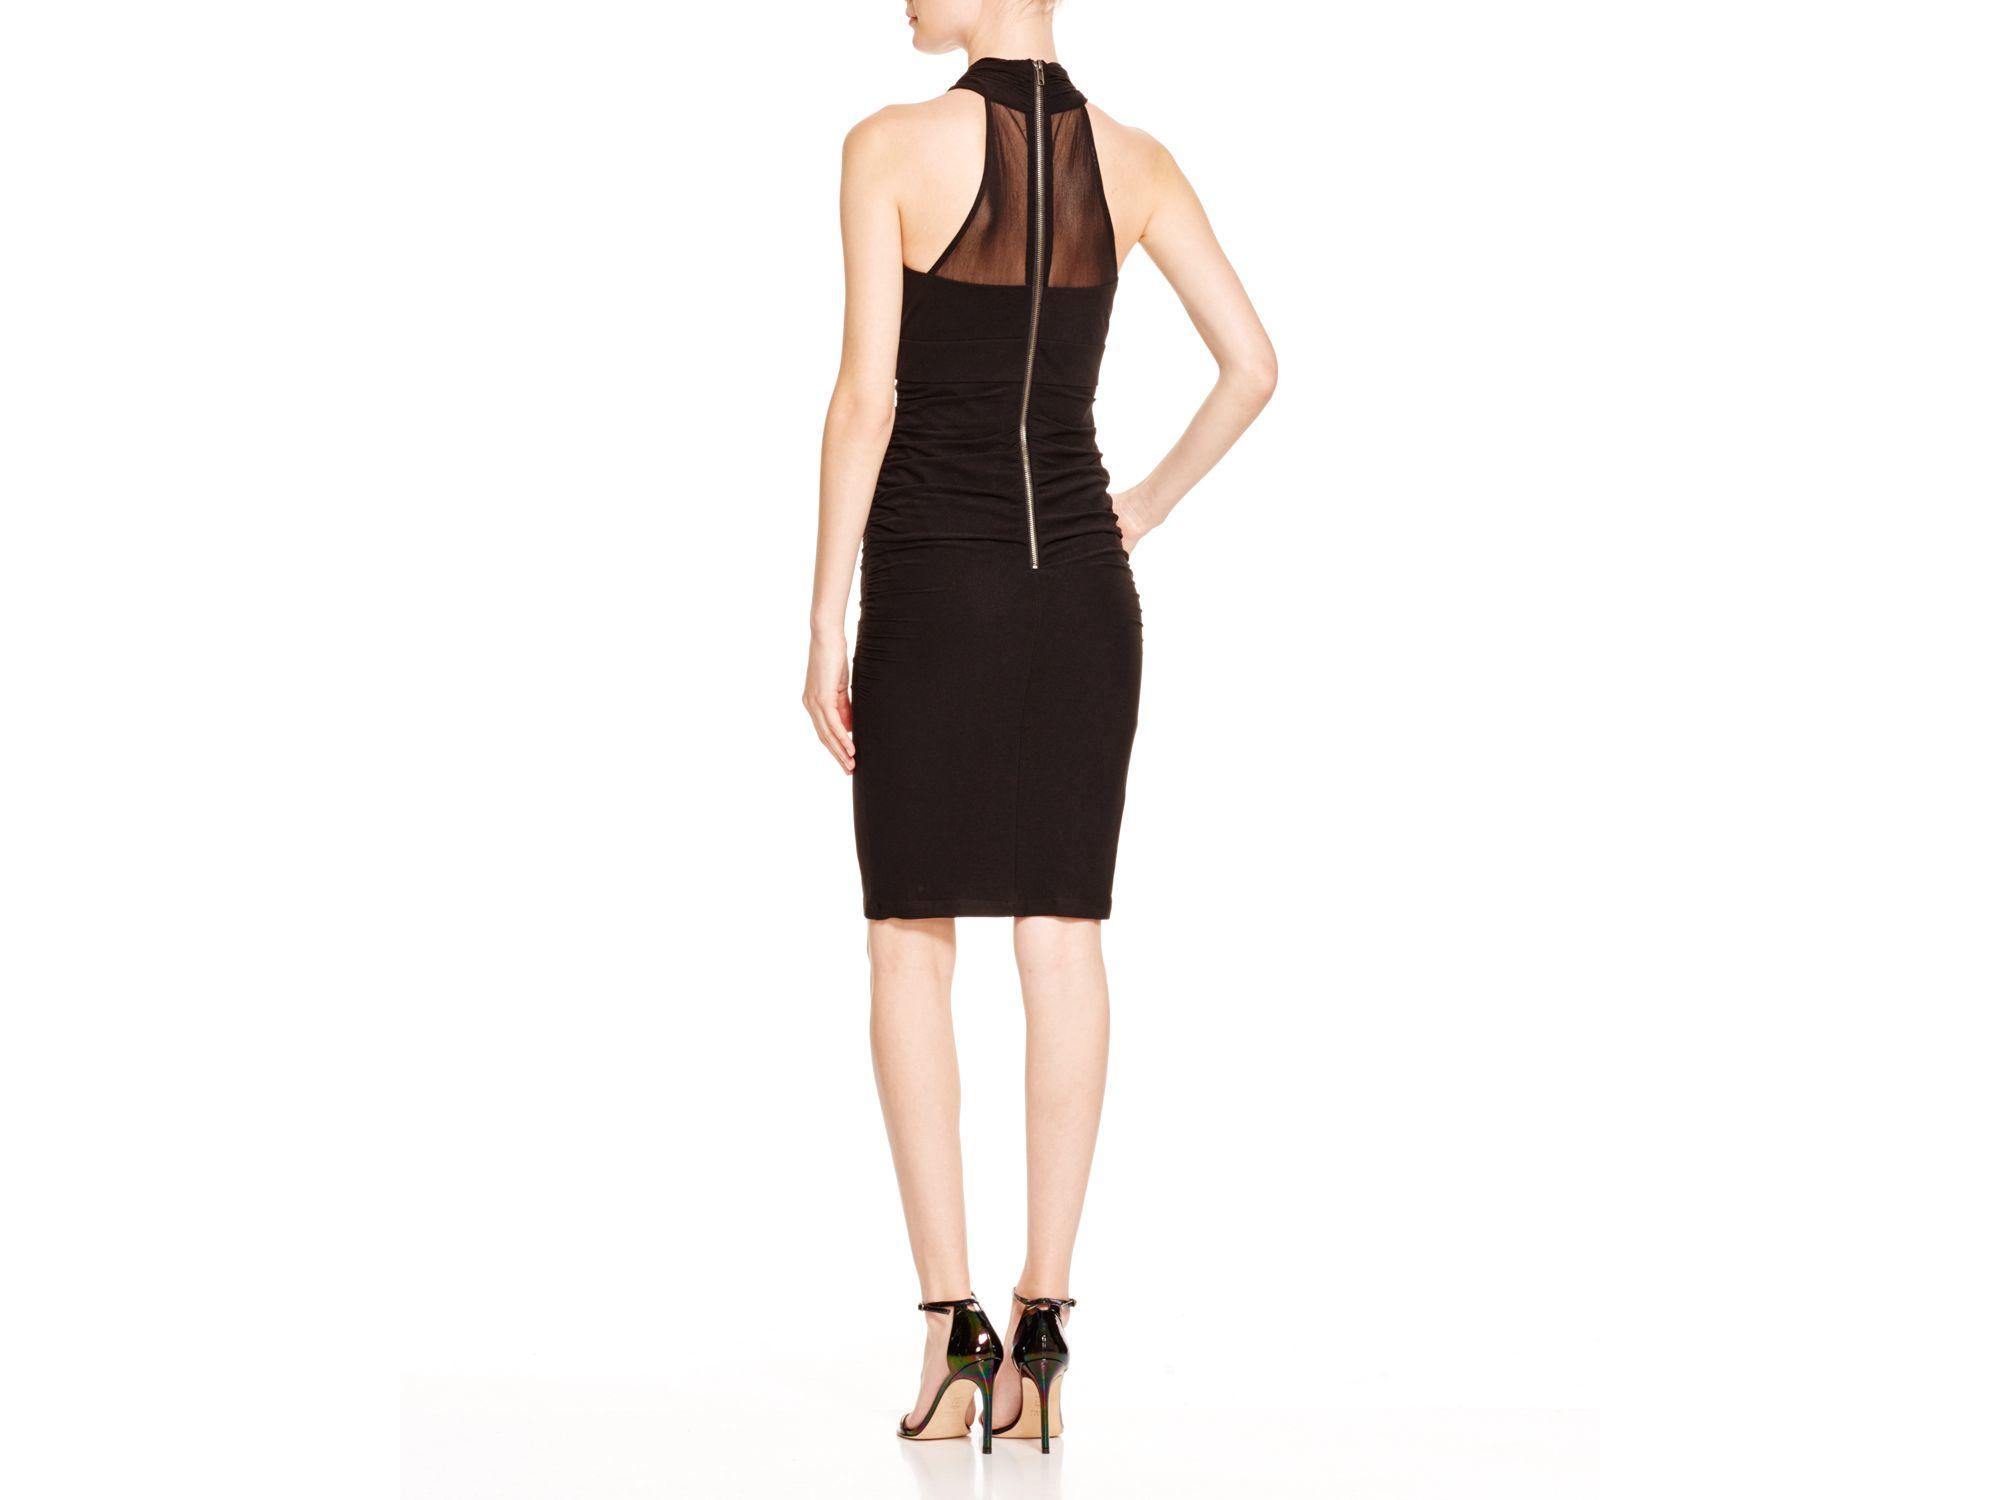 fb7d0c6a3f6d Lyst - Bardot Mesh-paneled Faux Wrap Dress in Black